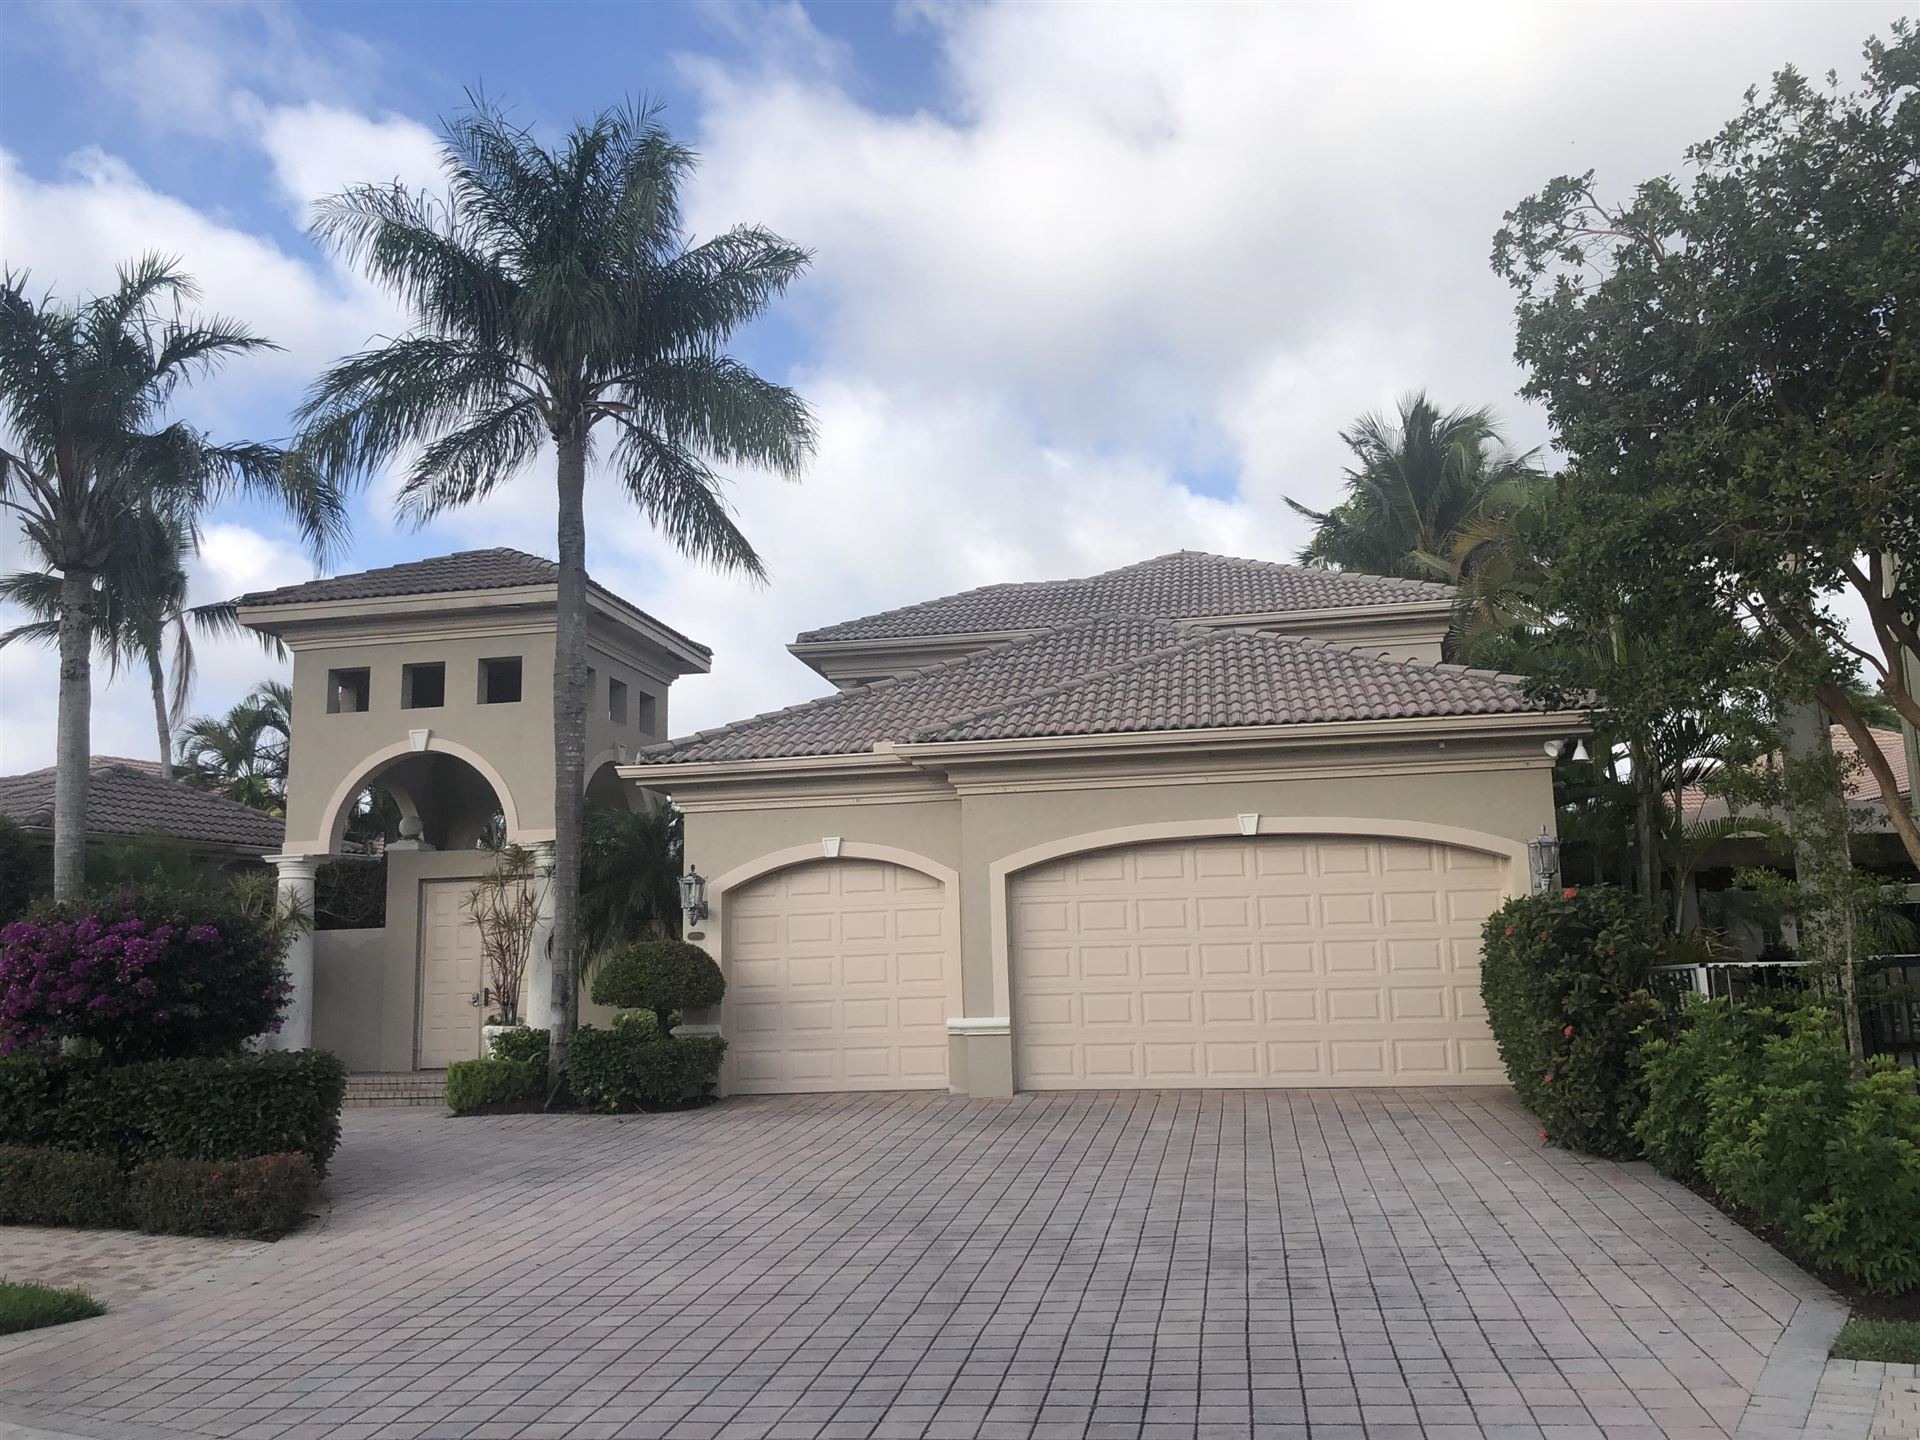 Photo of 125 Vintage Isle Lane, Palm Beach Gardens, FL 33418 (MLS # RX-10696912)